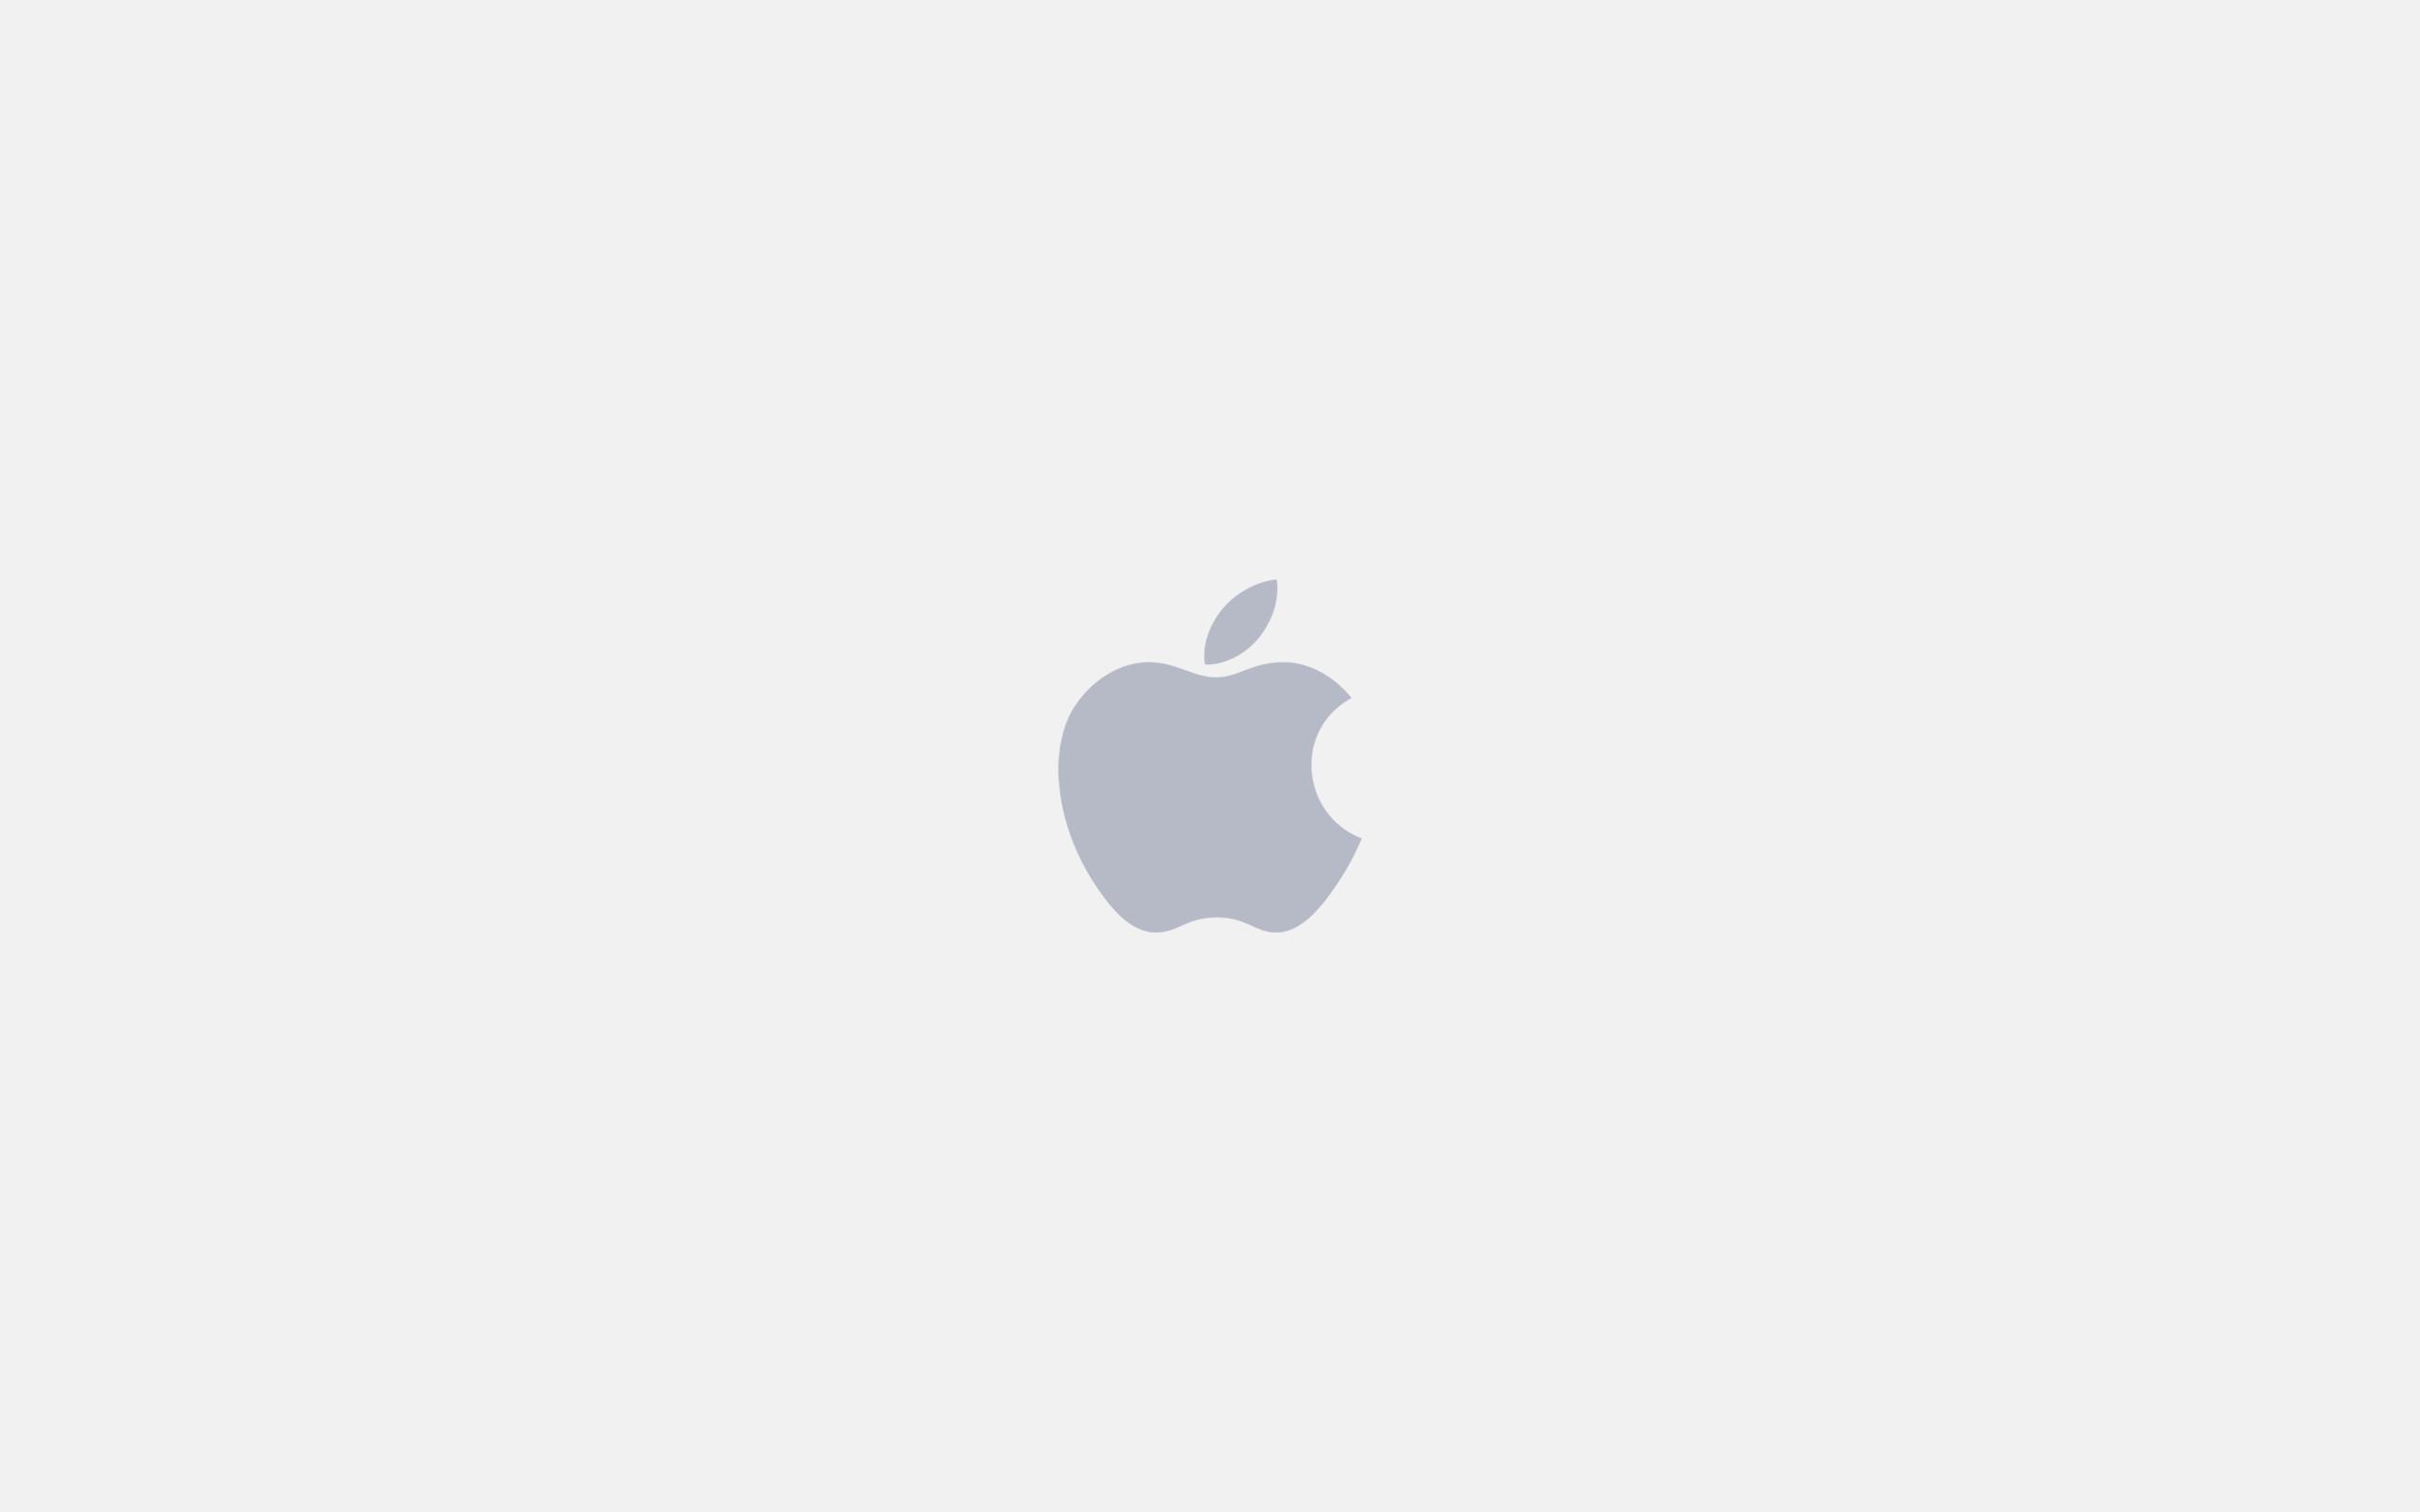 Minimal Apple Logo Wallpaper